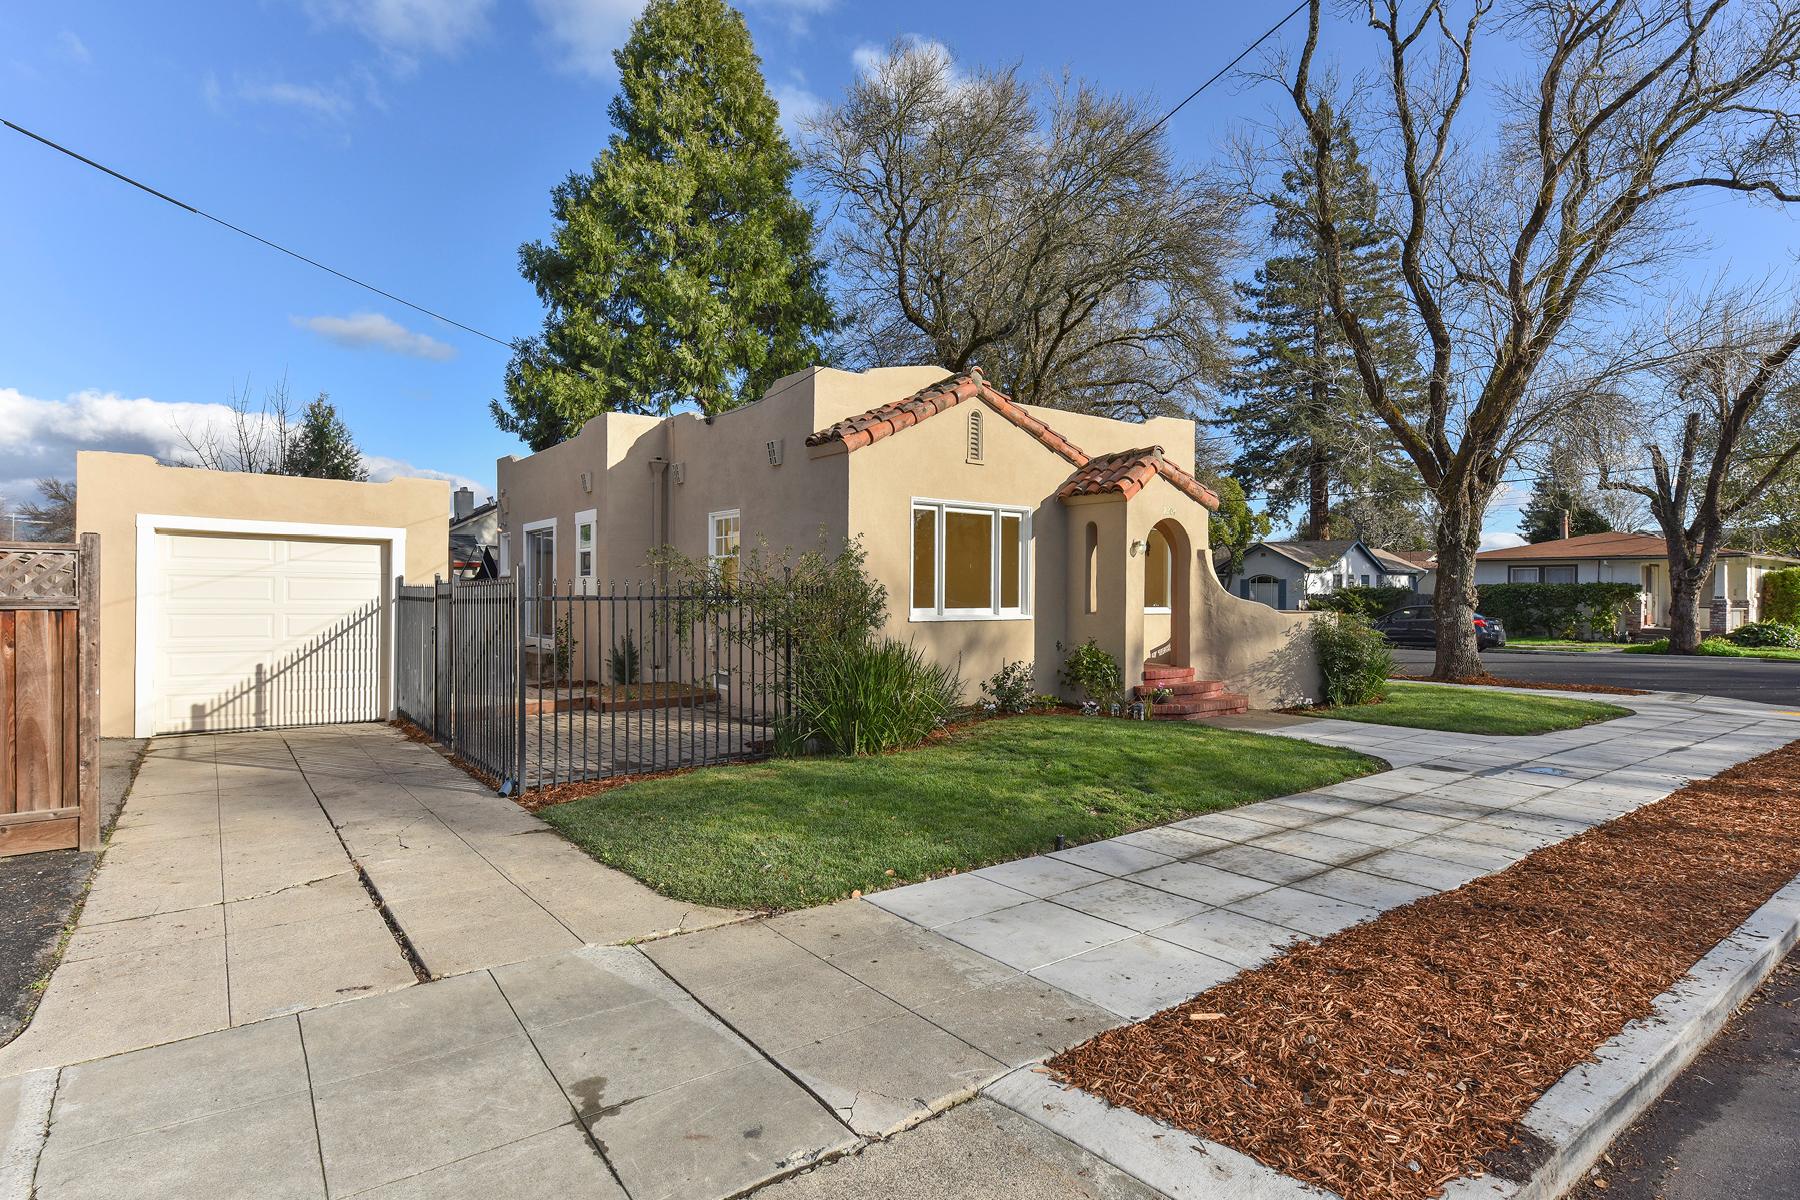 sales property at 2204 Spencer St, Napa, CA 94559